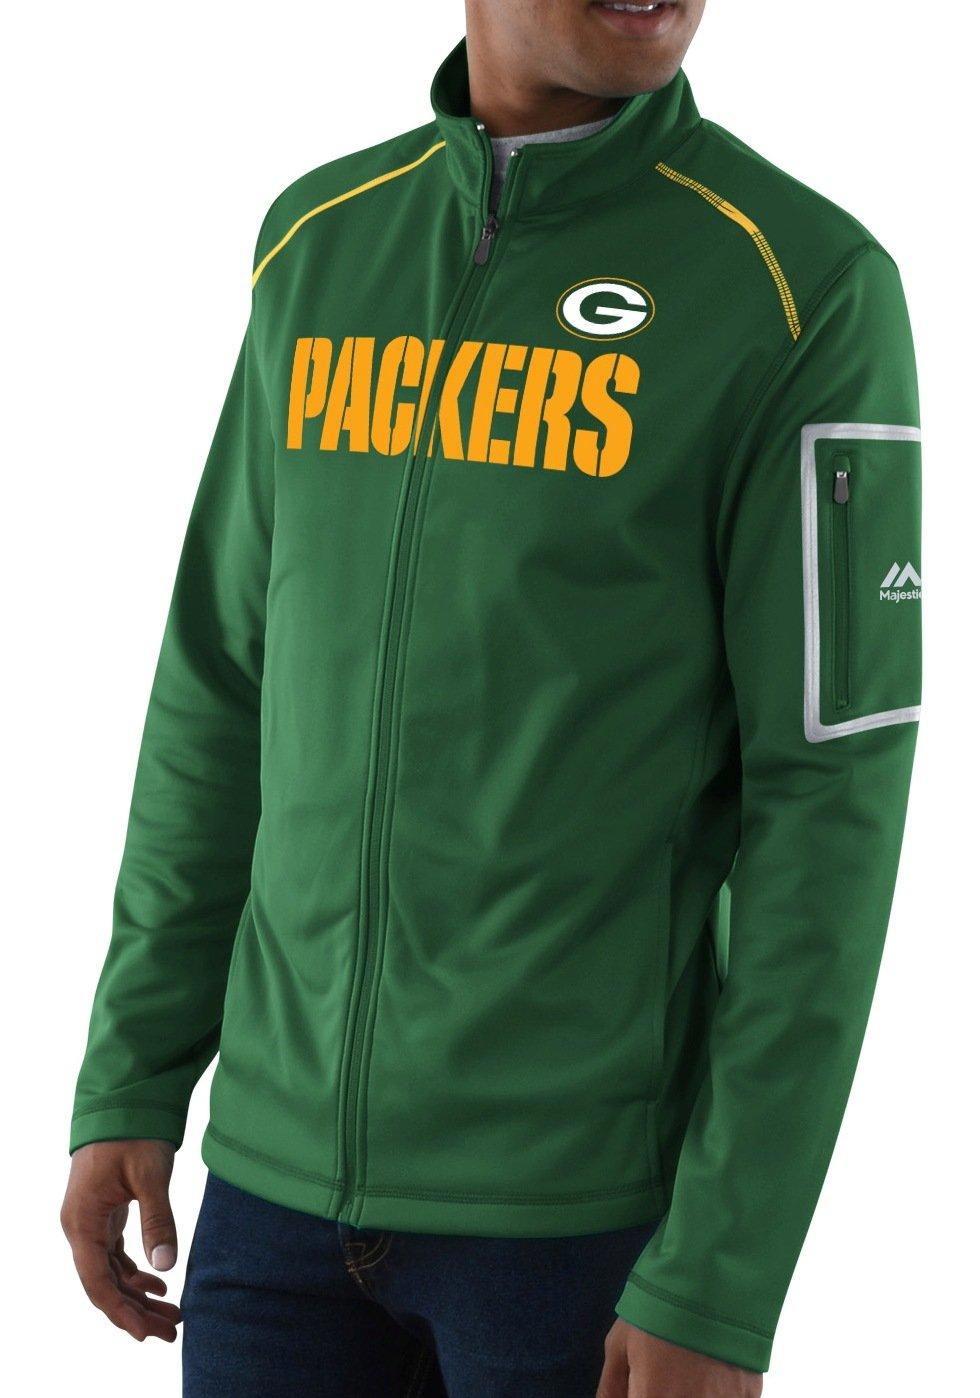 Green Bay Packers Majestic NFL「チームワーク」メンズFull Zip Mock Neck Sweatshirt XL  B072QTJFWX